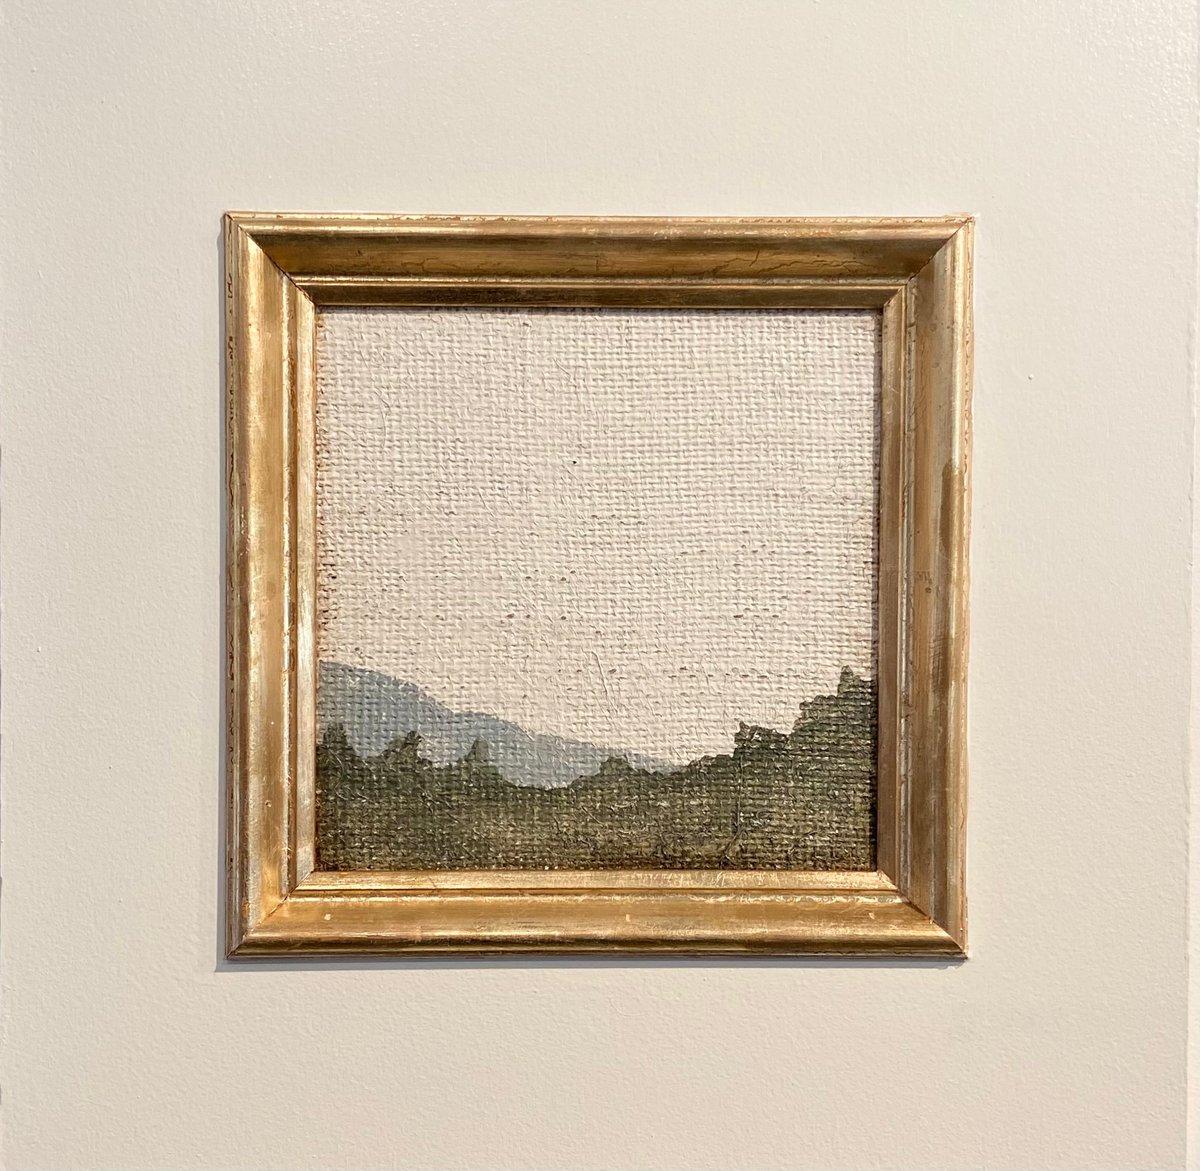 Image of Tuscan Landscape 1 16x16